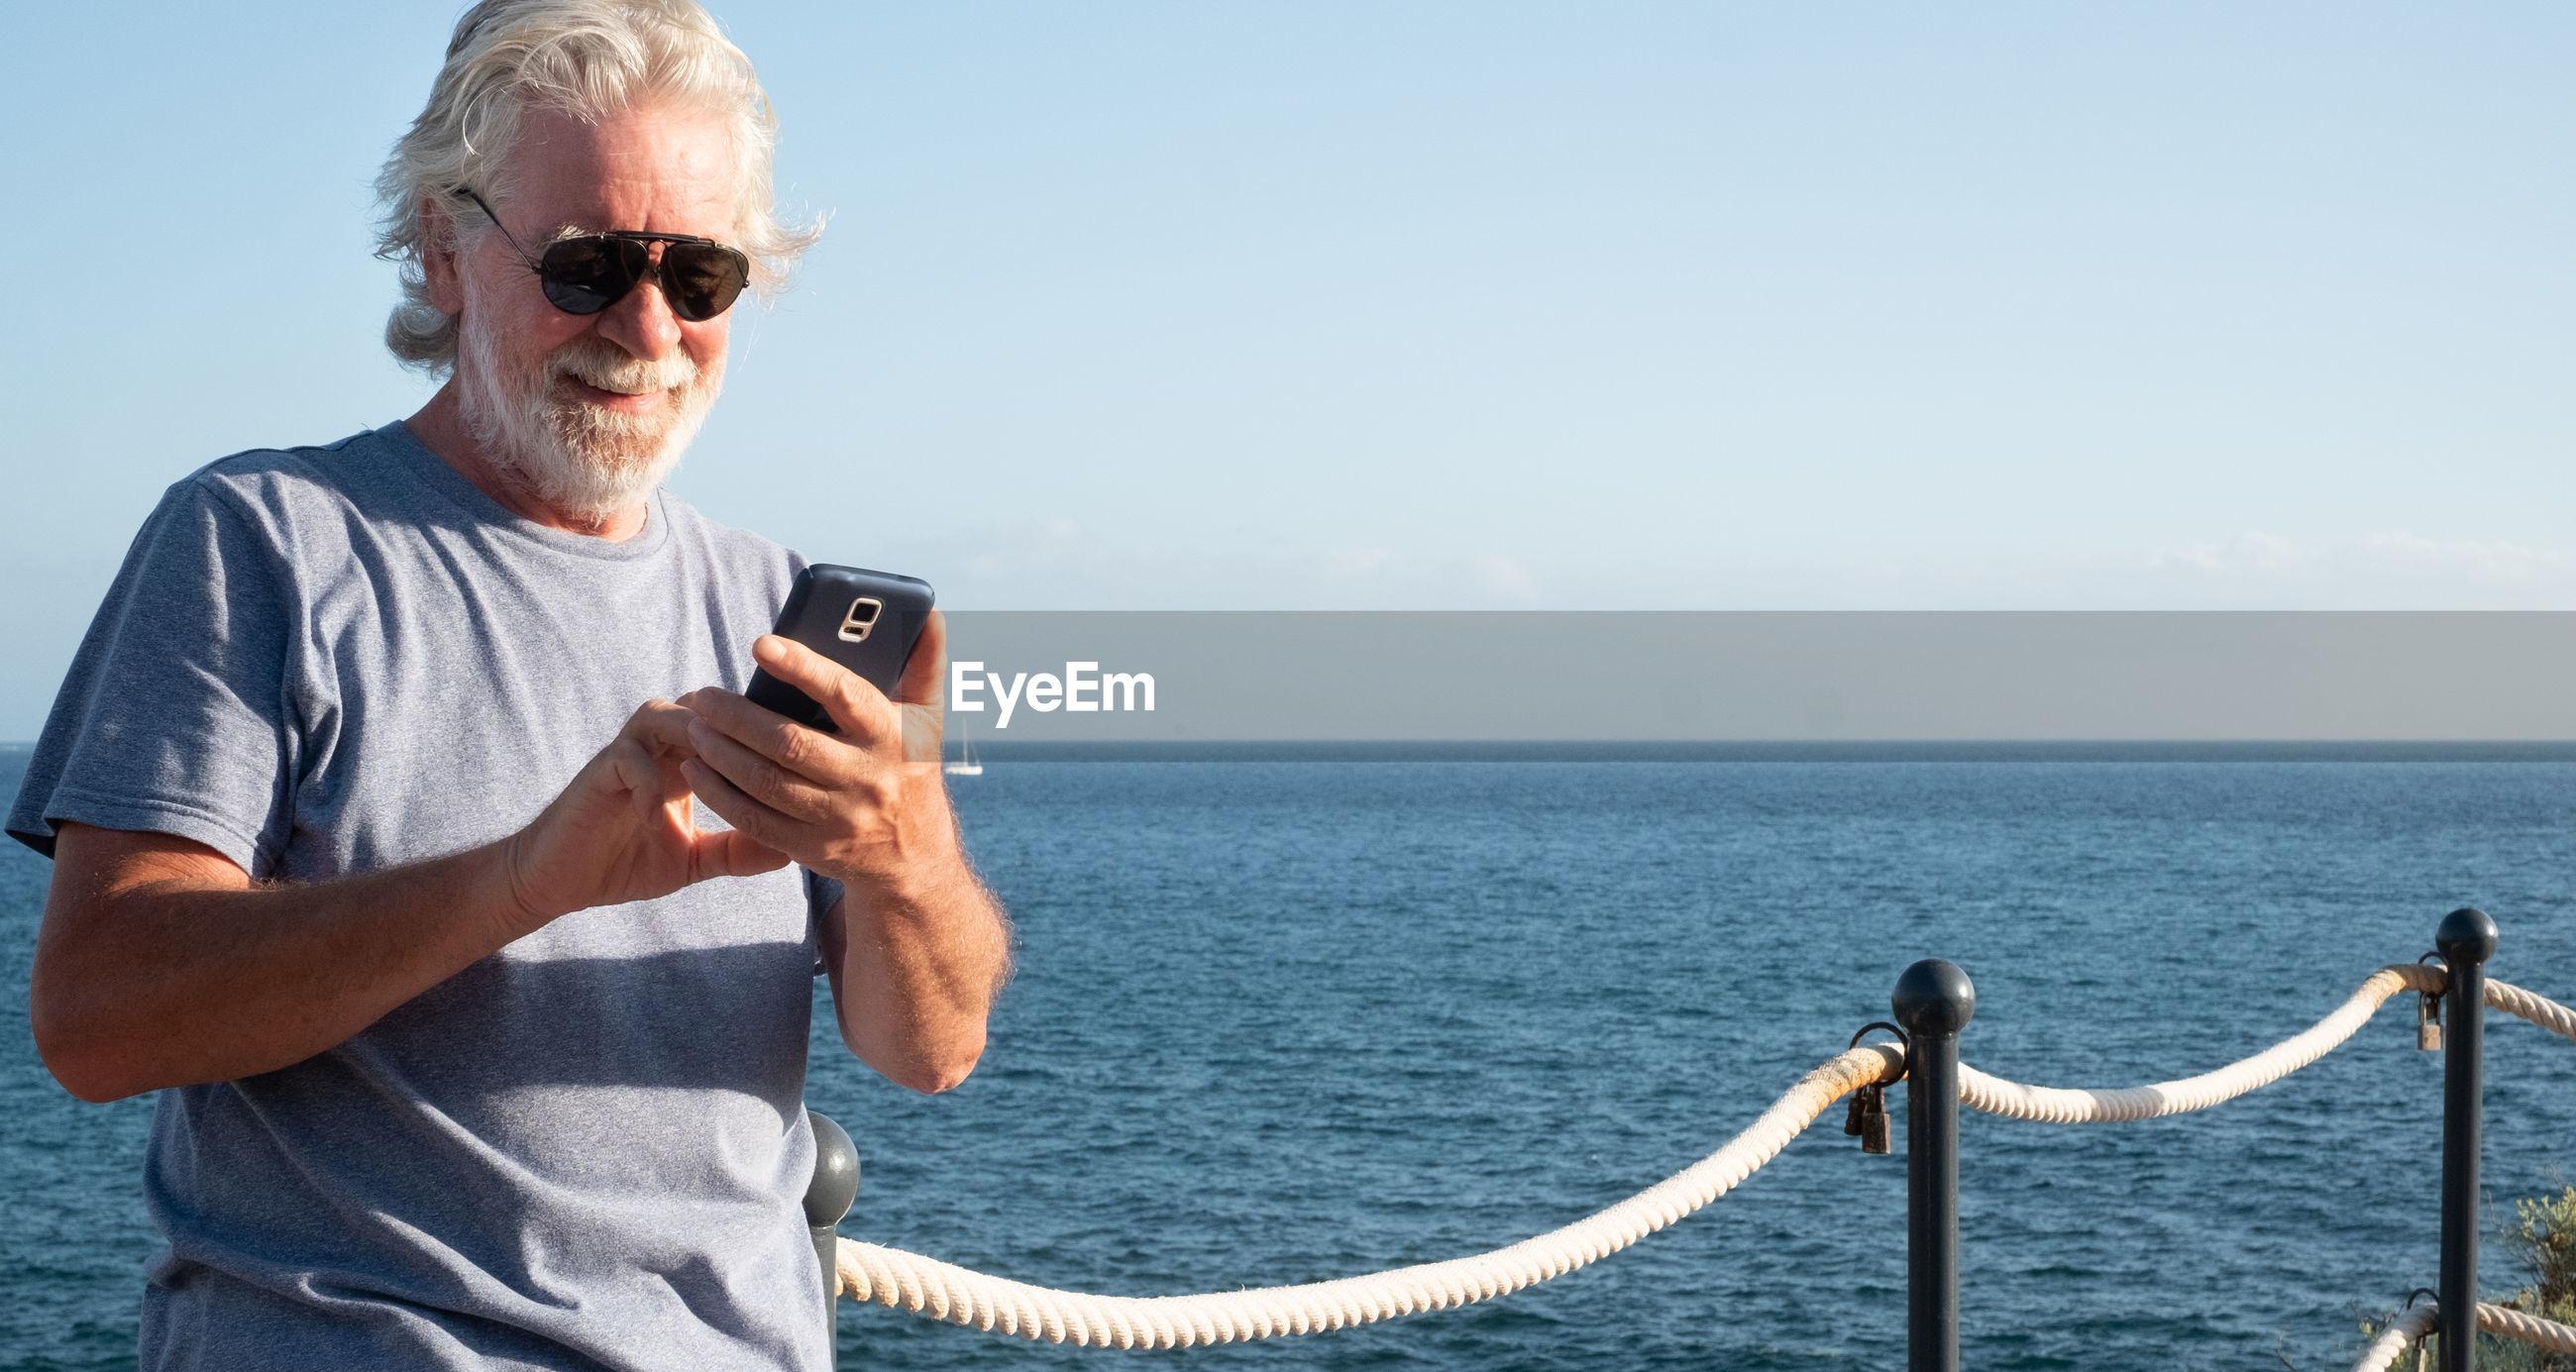 Smiling senior man using mobile phone while standing at sea